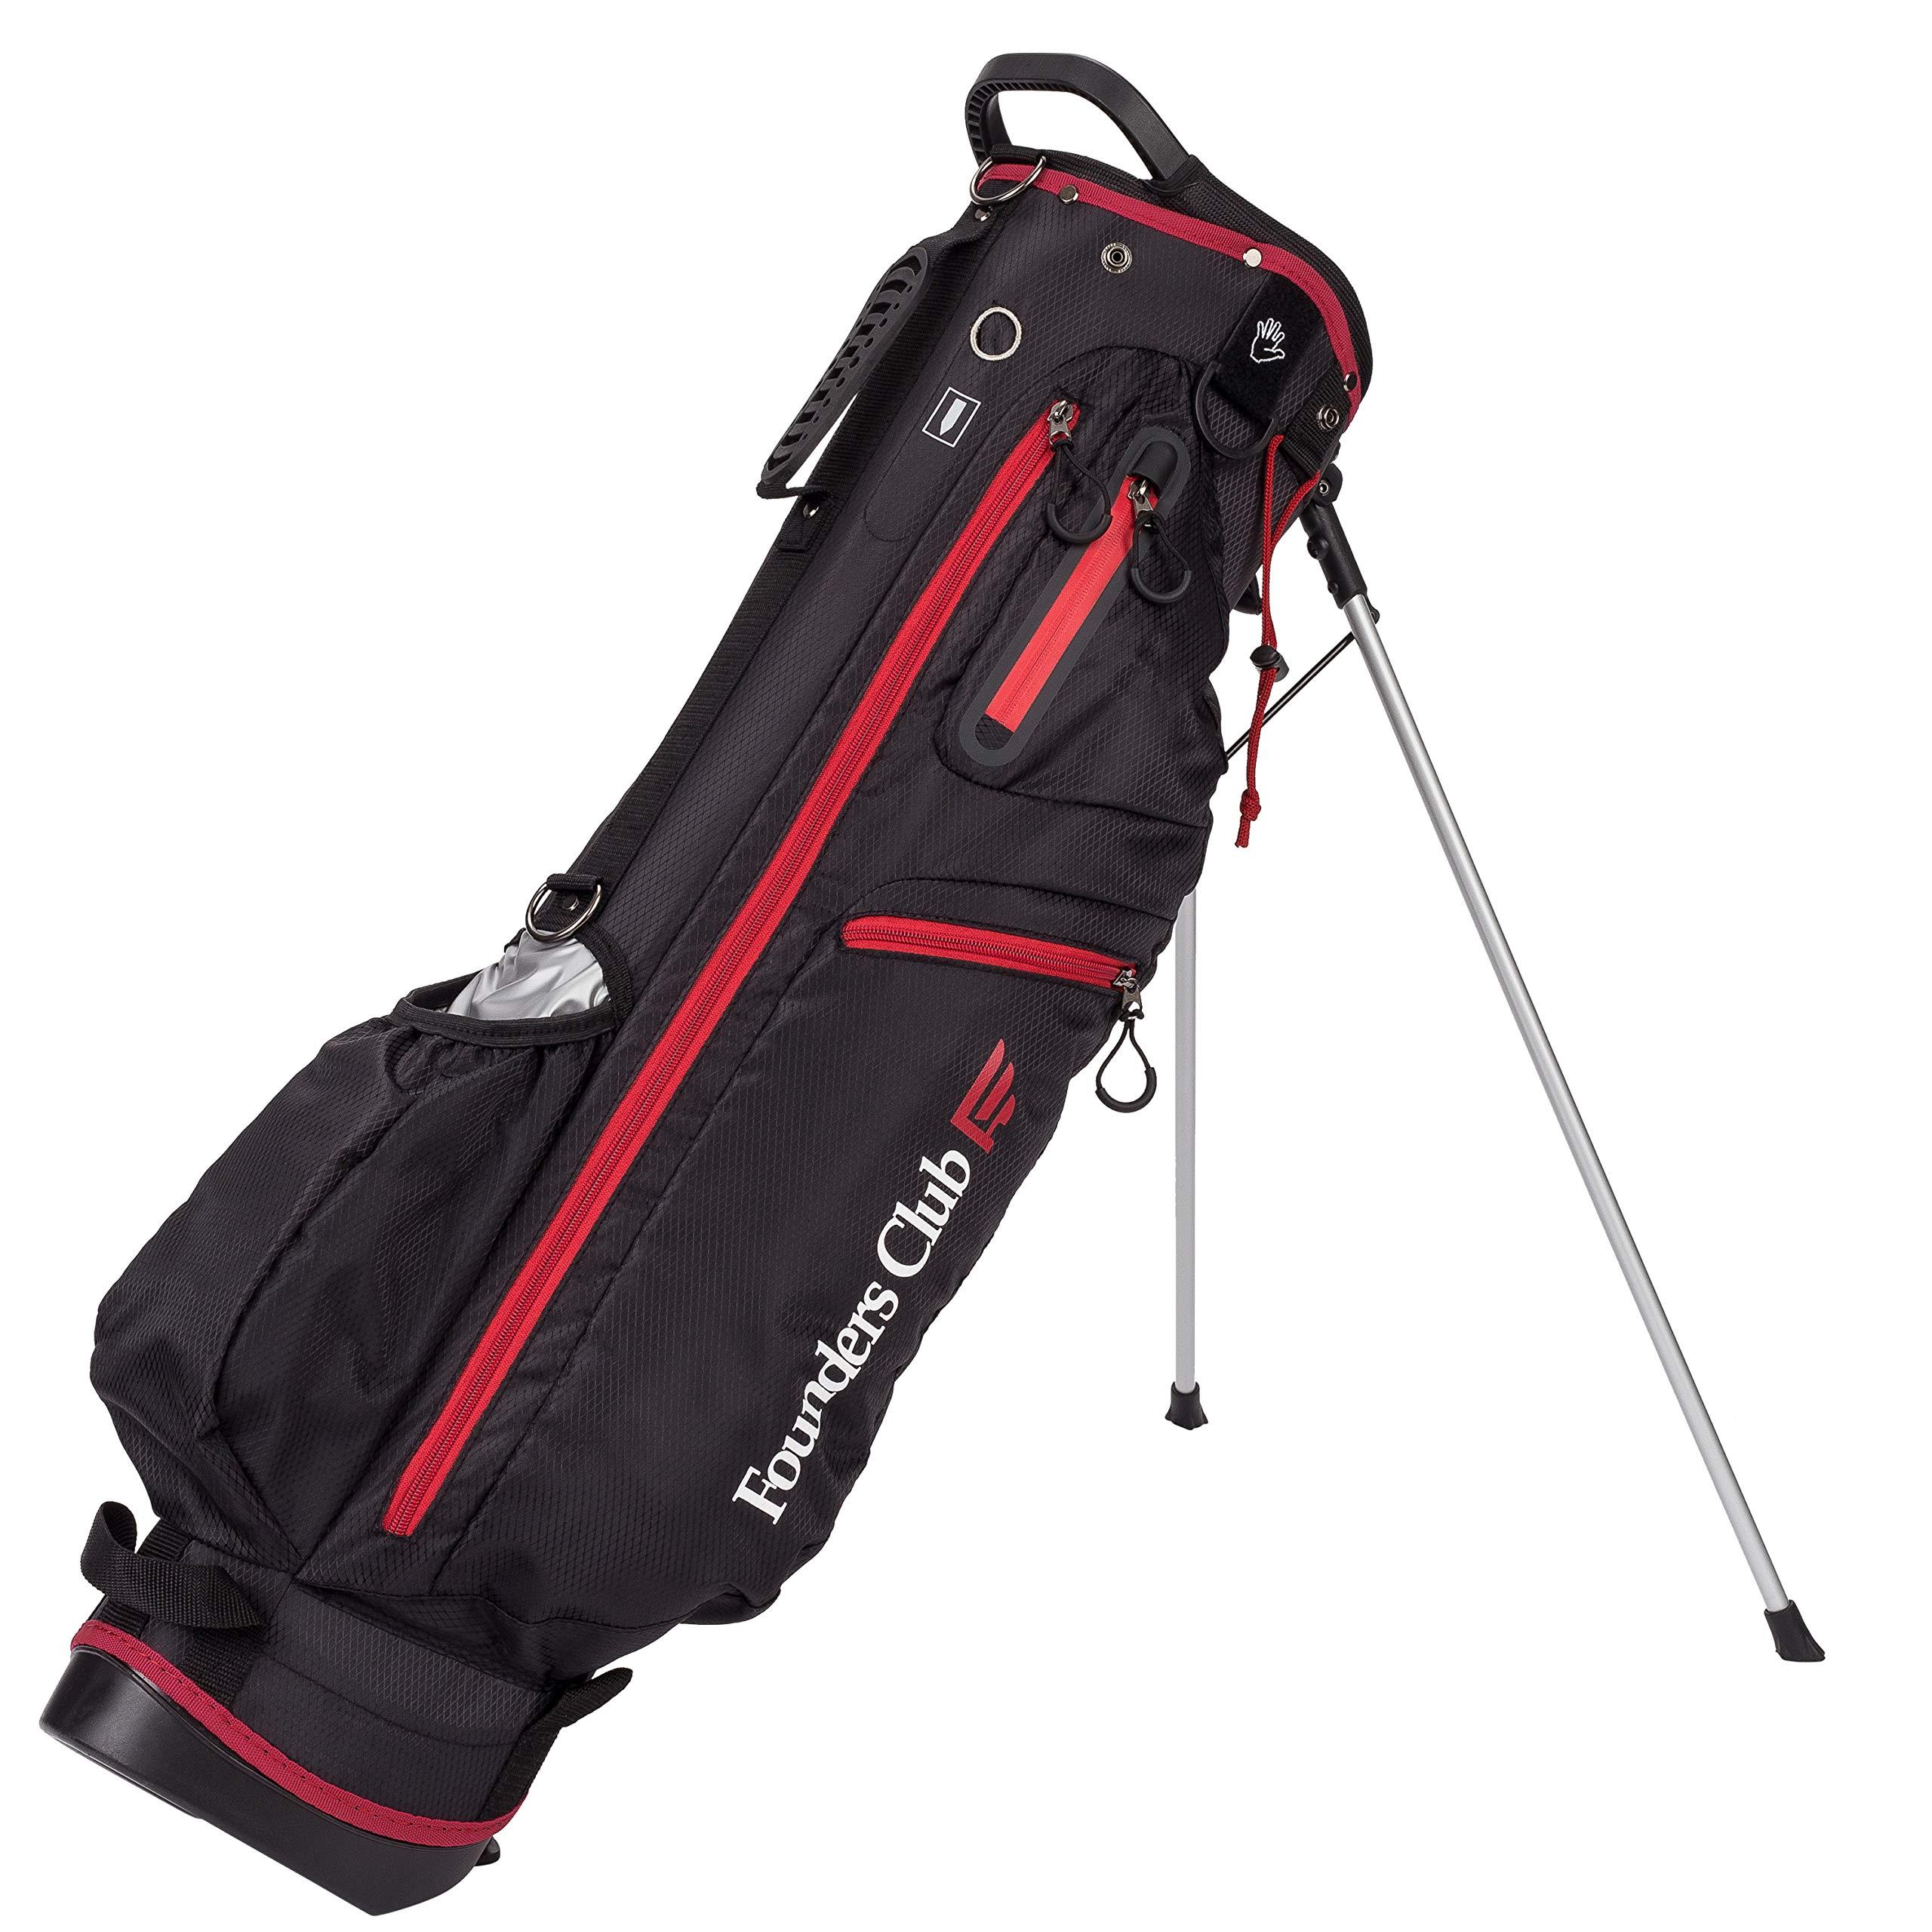 Founders Club 7'' Mini Light Weight Golf Stand Bag (Black)